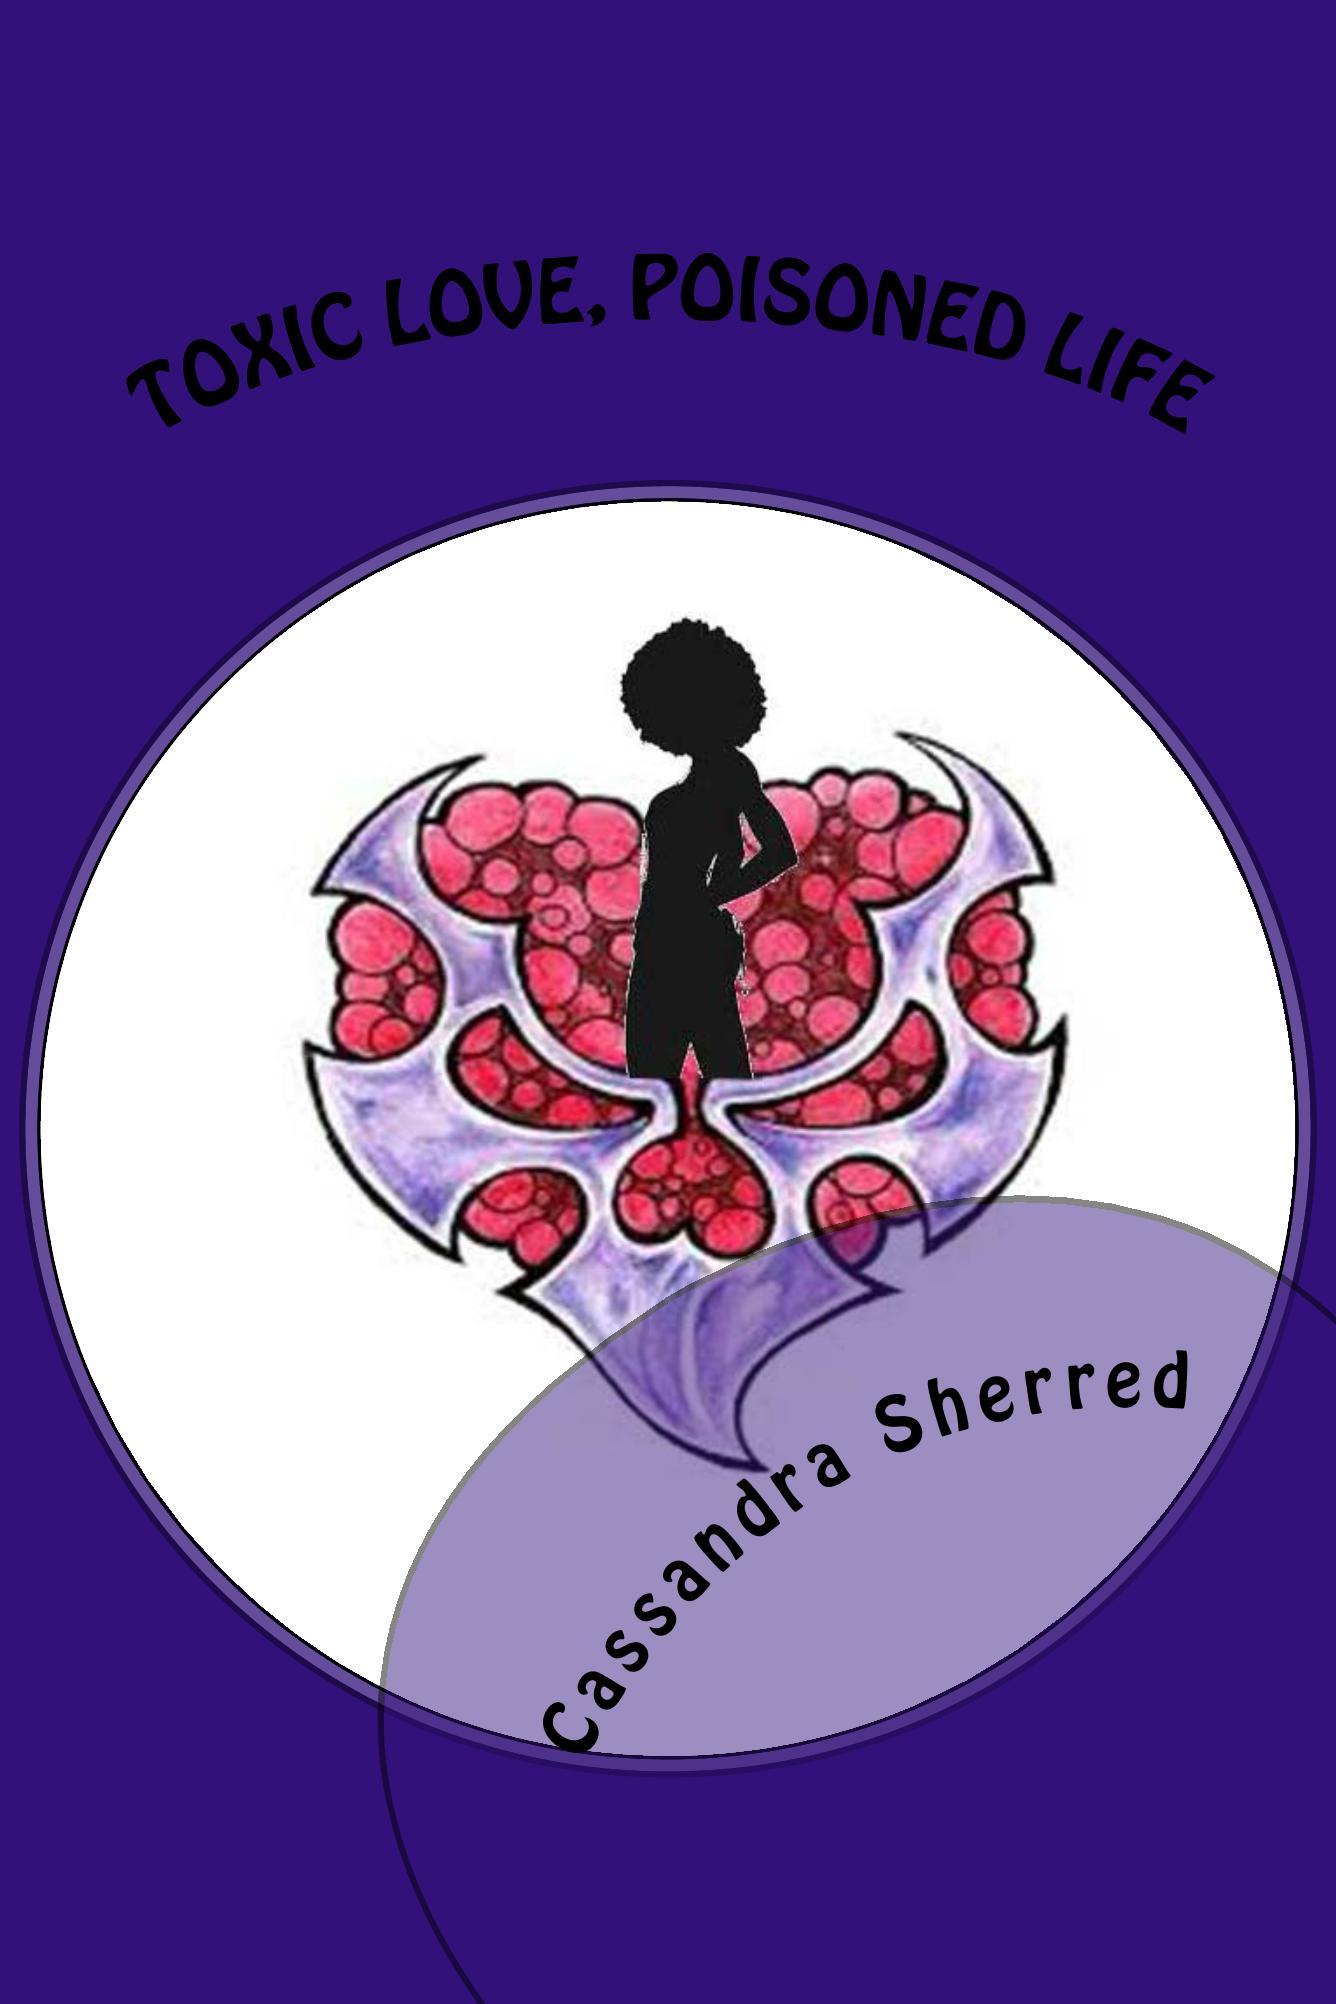 Toxic Love, Poisoned Life